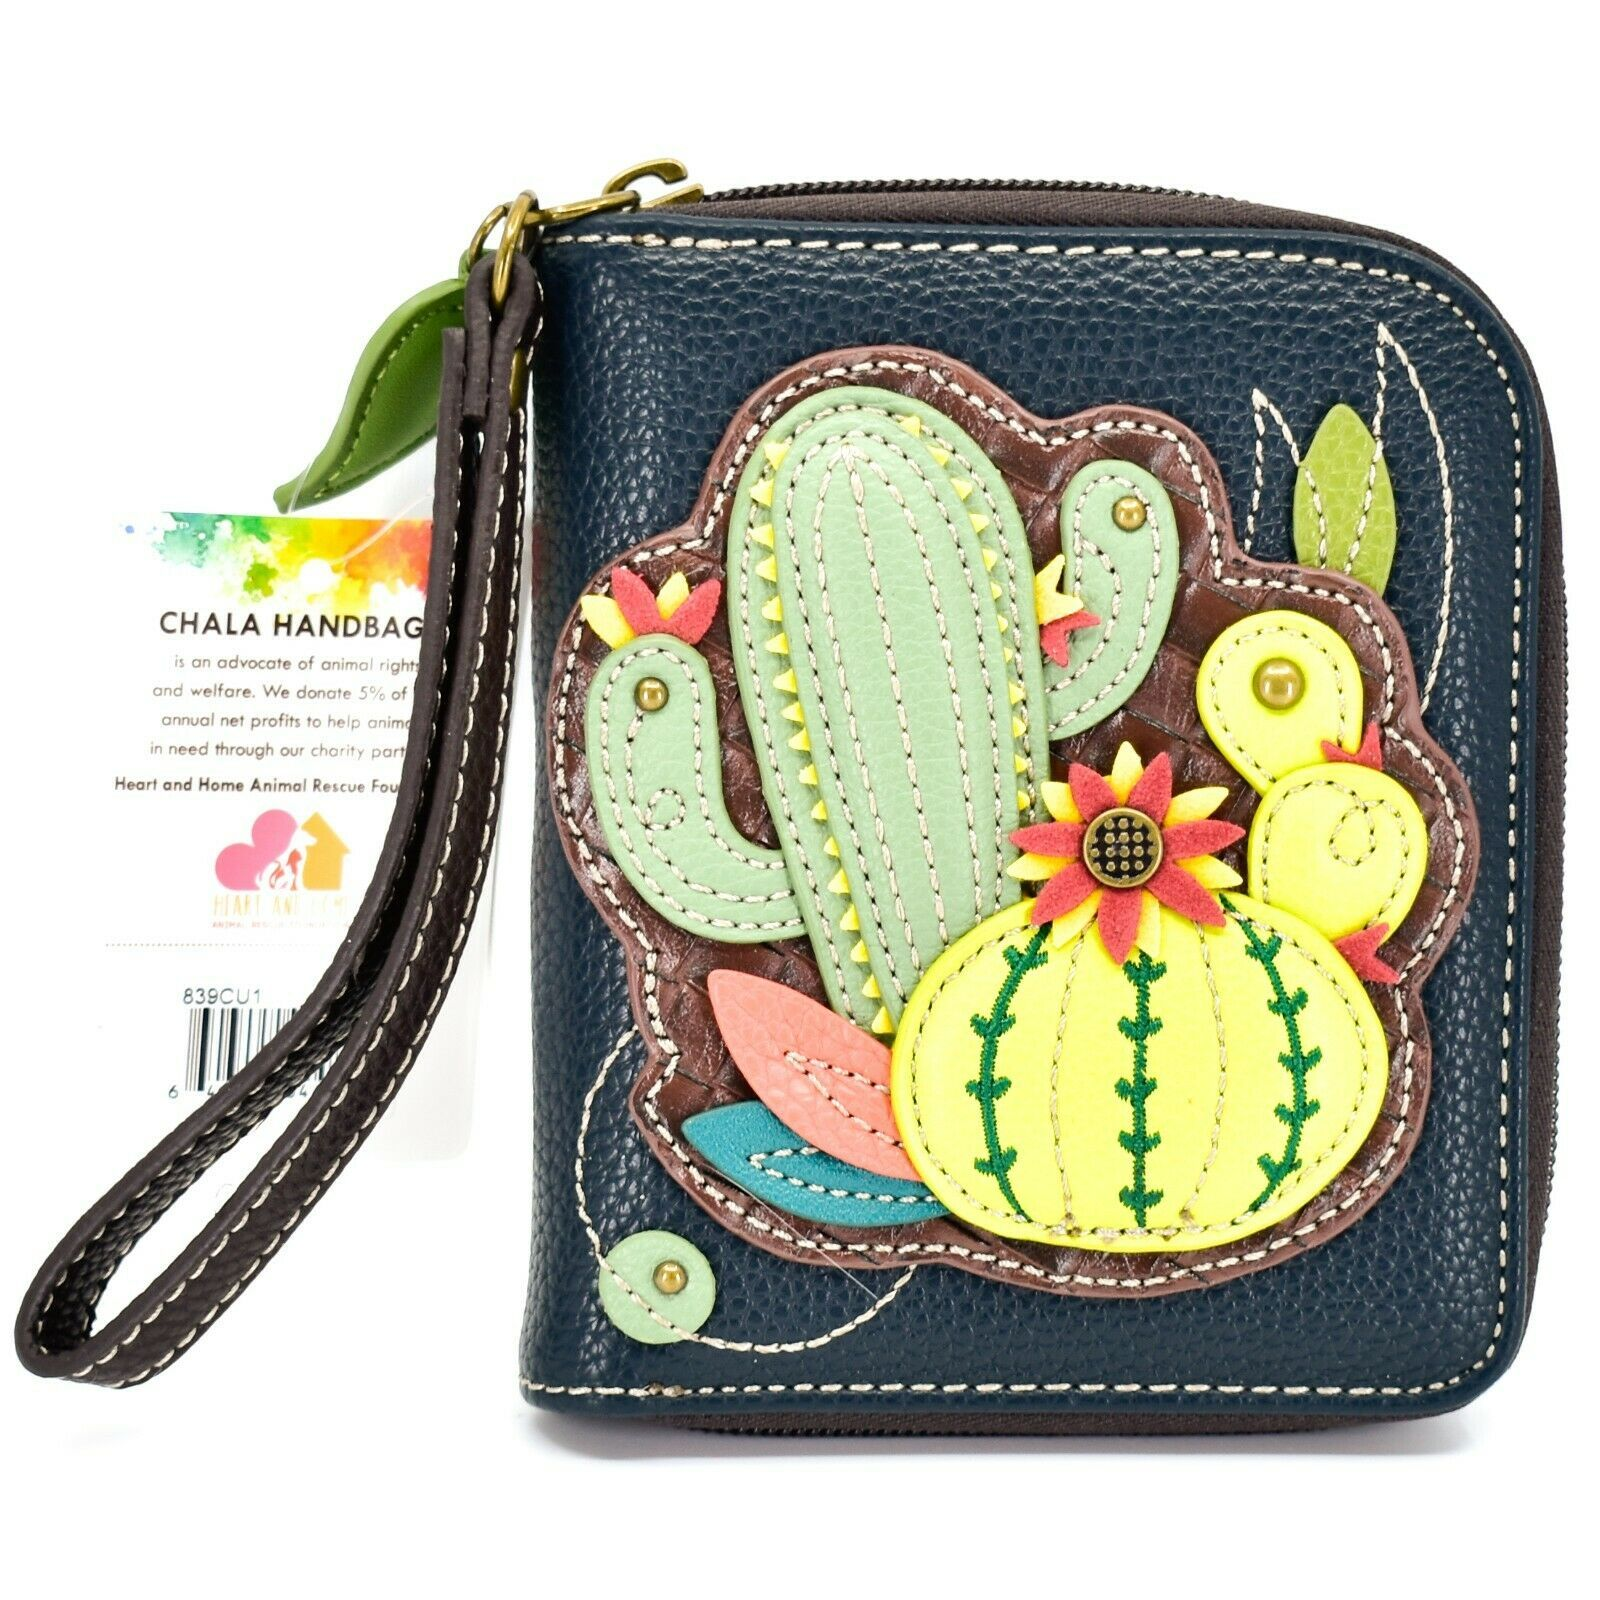 Chala Handbags Faux Leather Cactus Cacti  Zip Around Wristlet Wallet